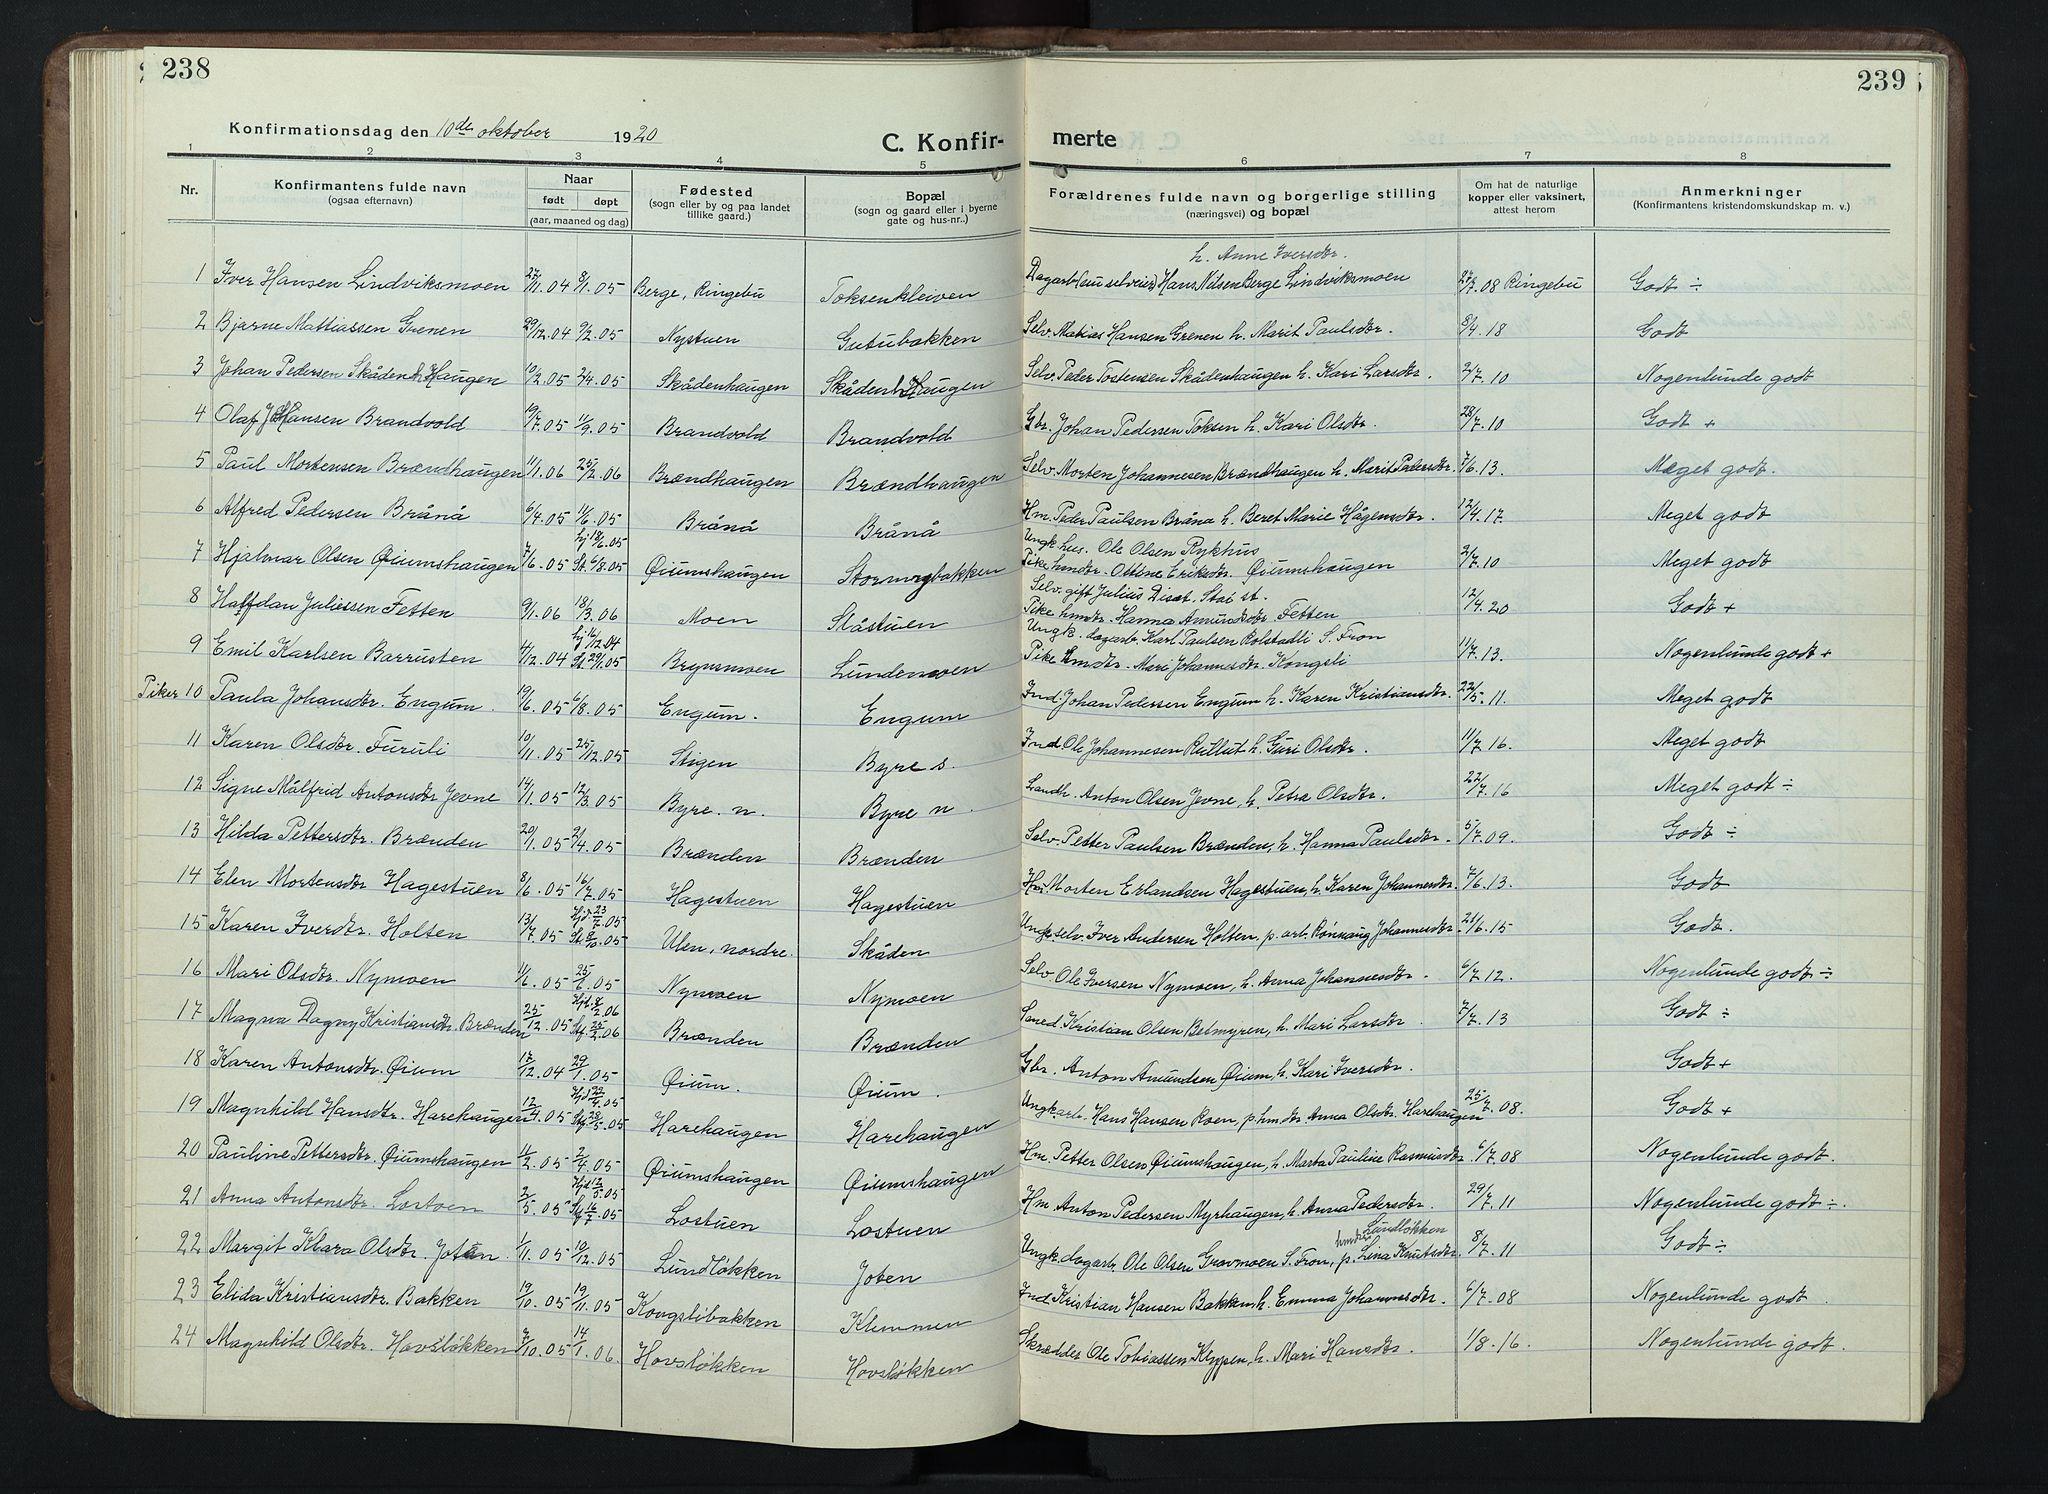 SAH, Nord-Fron prestekontor, Klokkerbok nr. 7, 1915-1946, s. 238-239